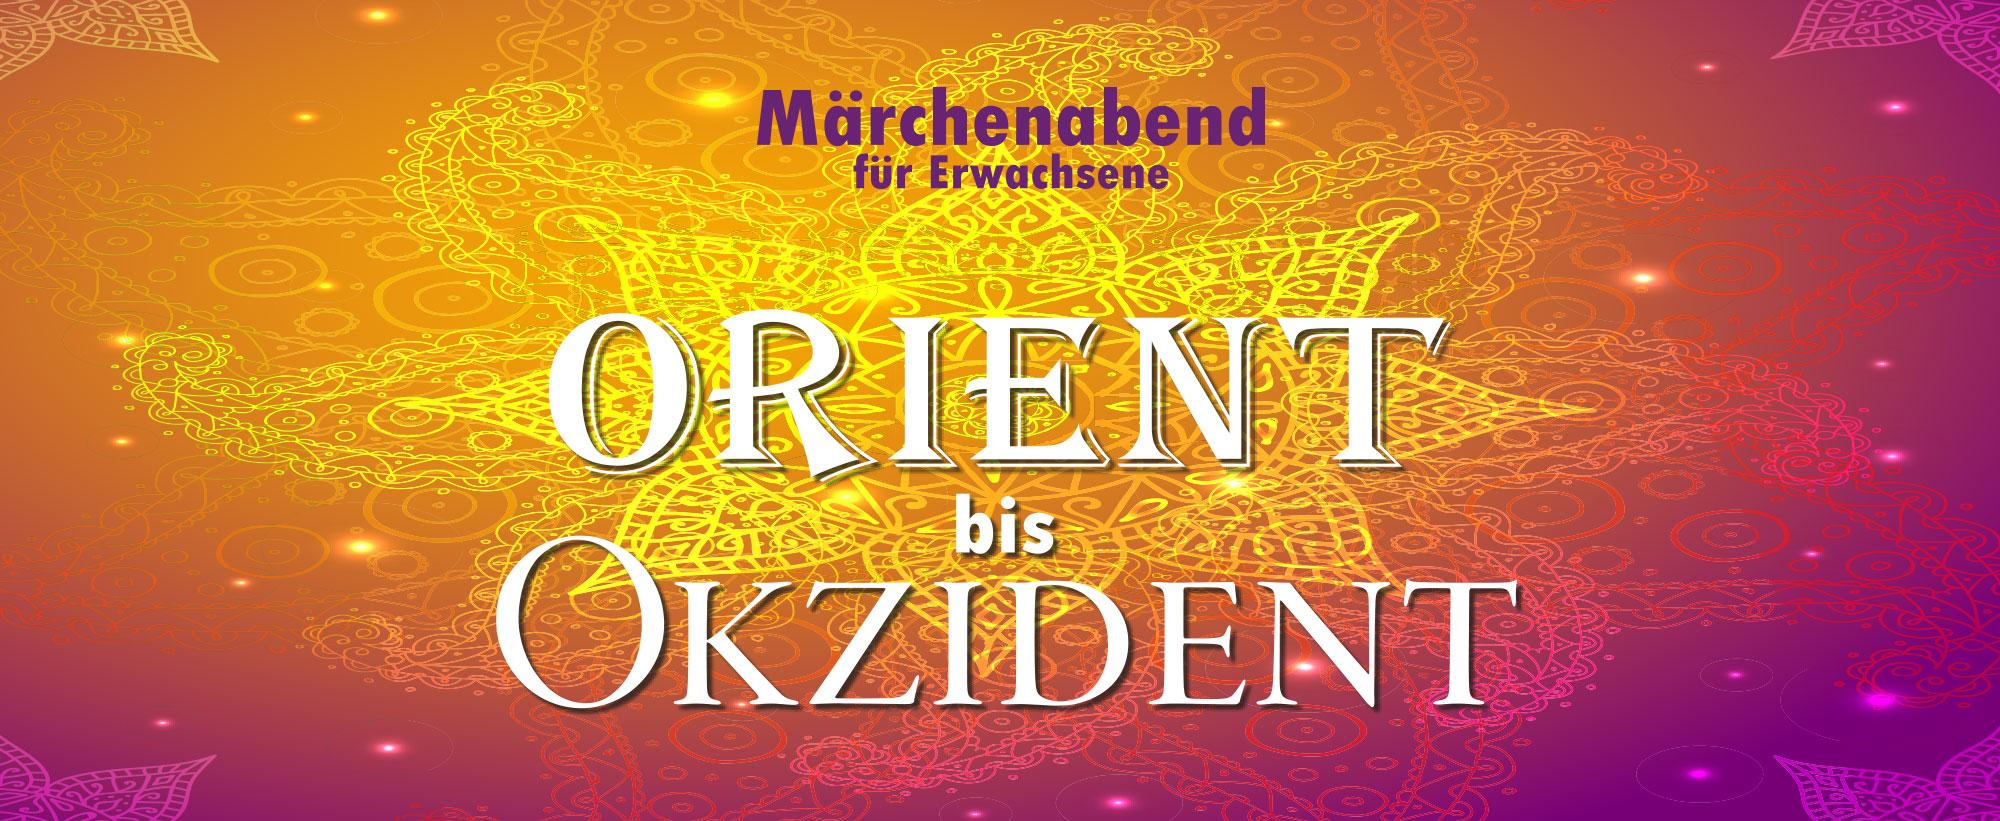 De Eeewent-Denis - Märchenabend 2019